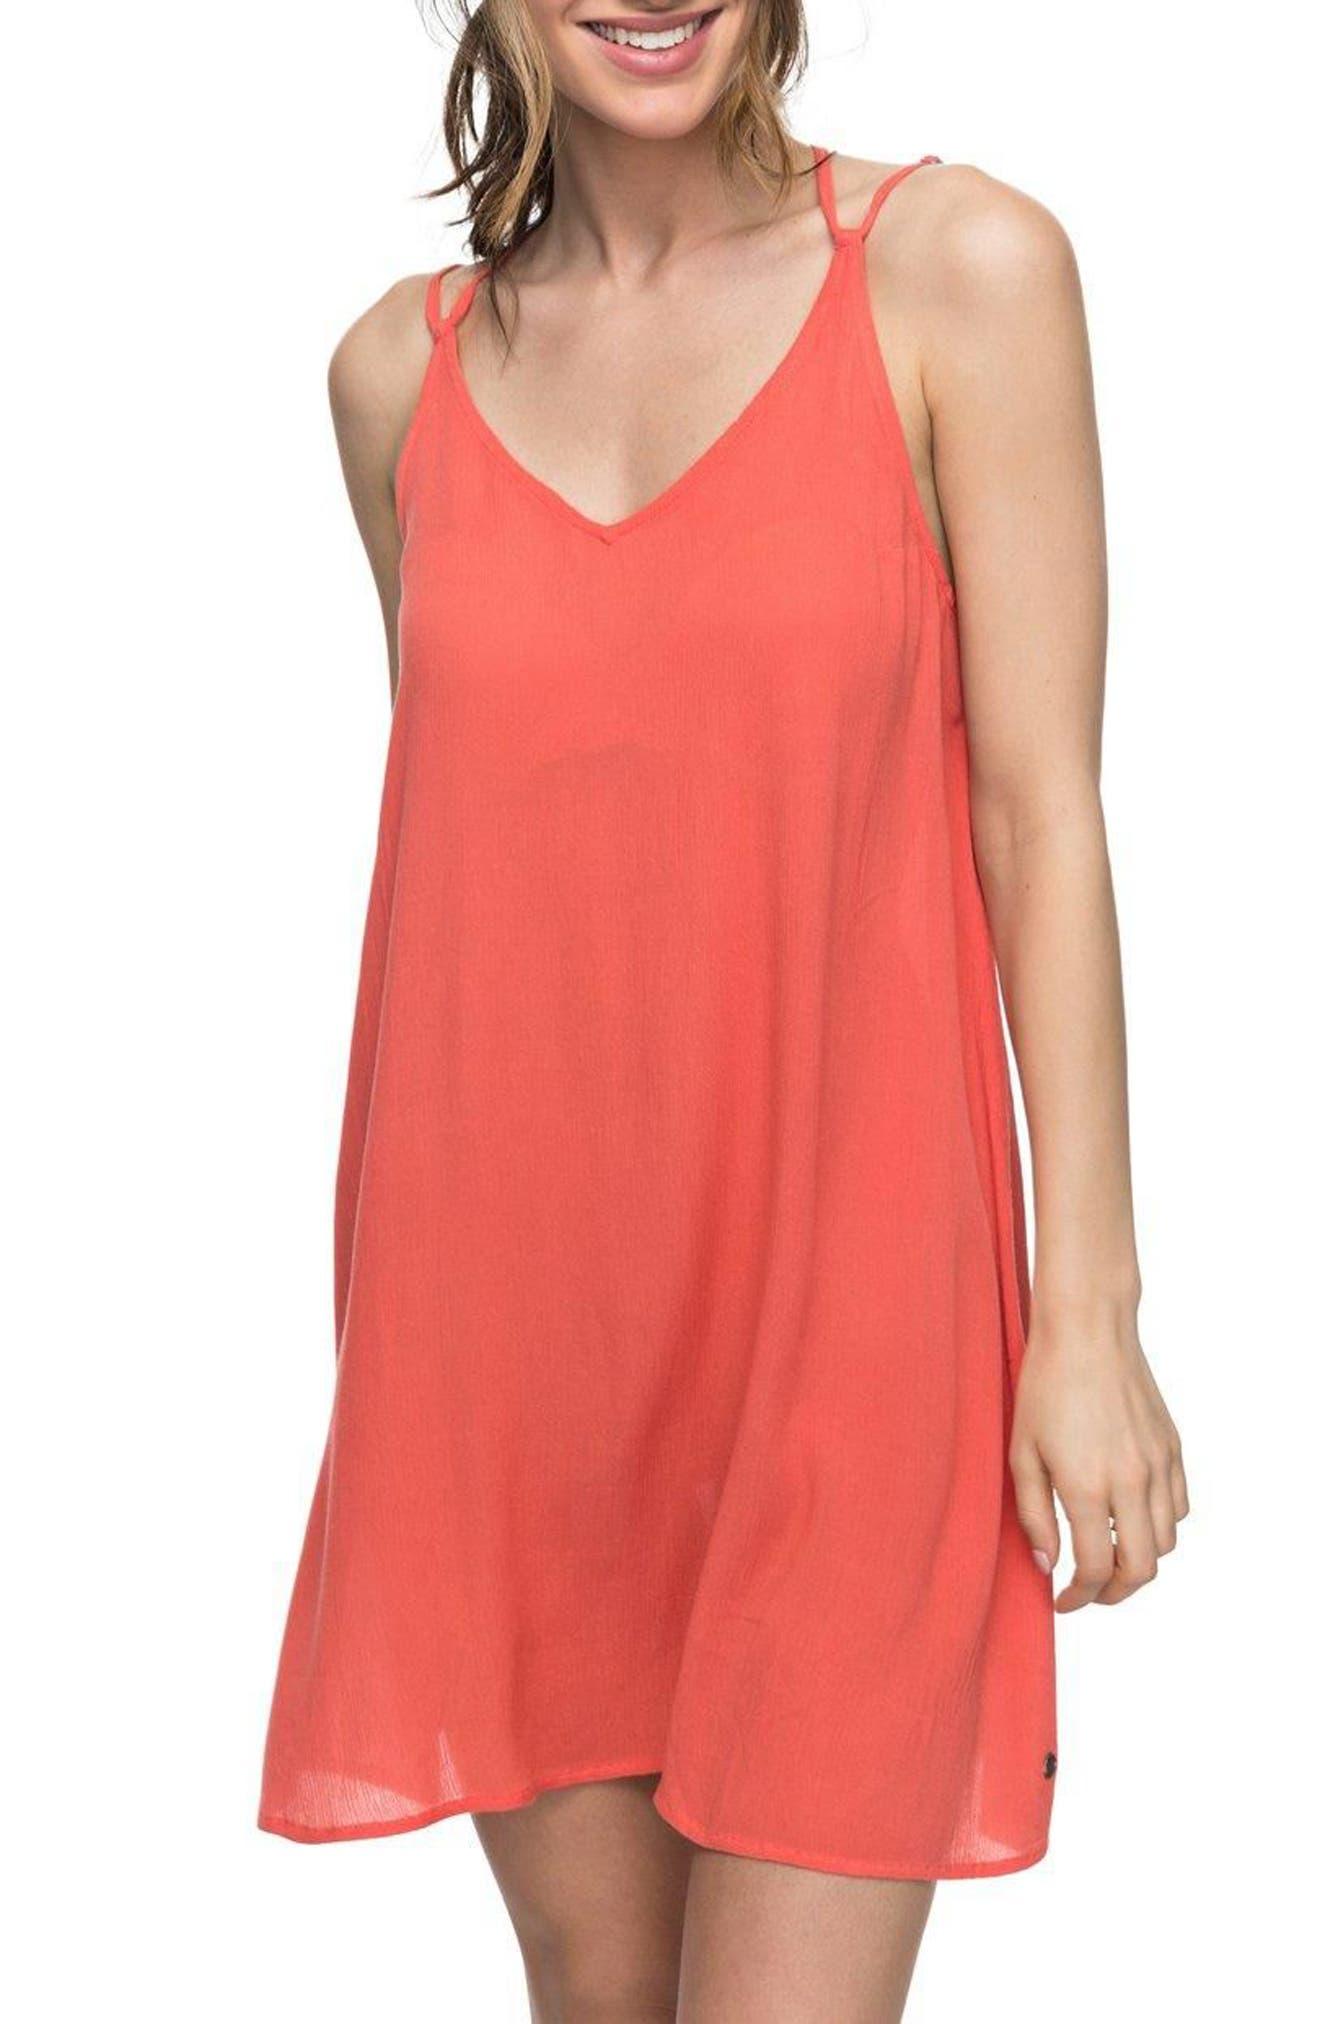 Main Image - Roxy Dome of Amalfi Strappy Camisole Dress